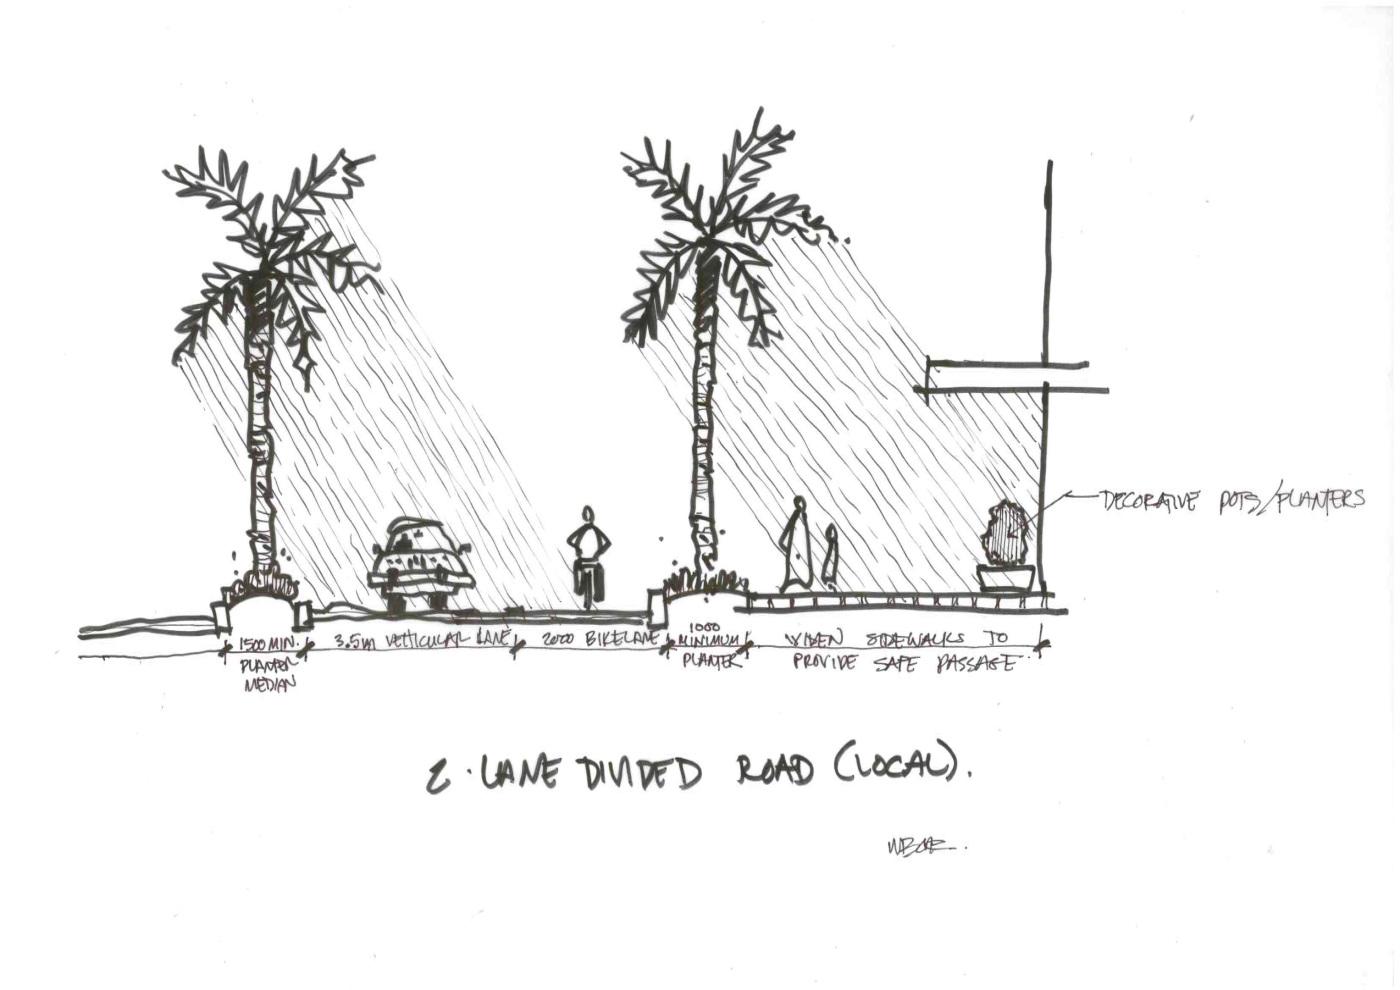 2-Lane Road-Median 1